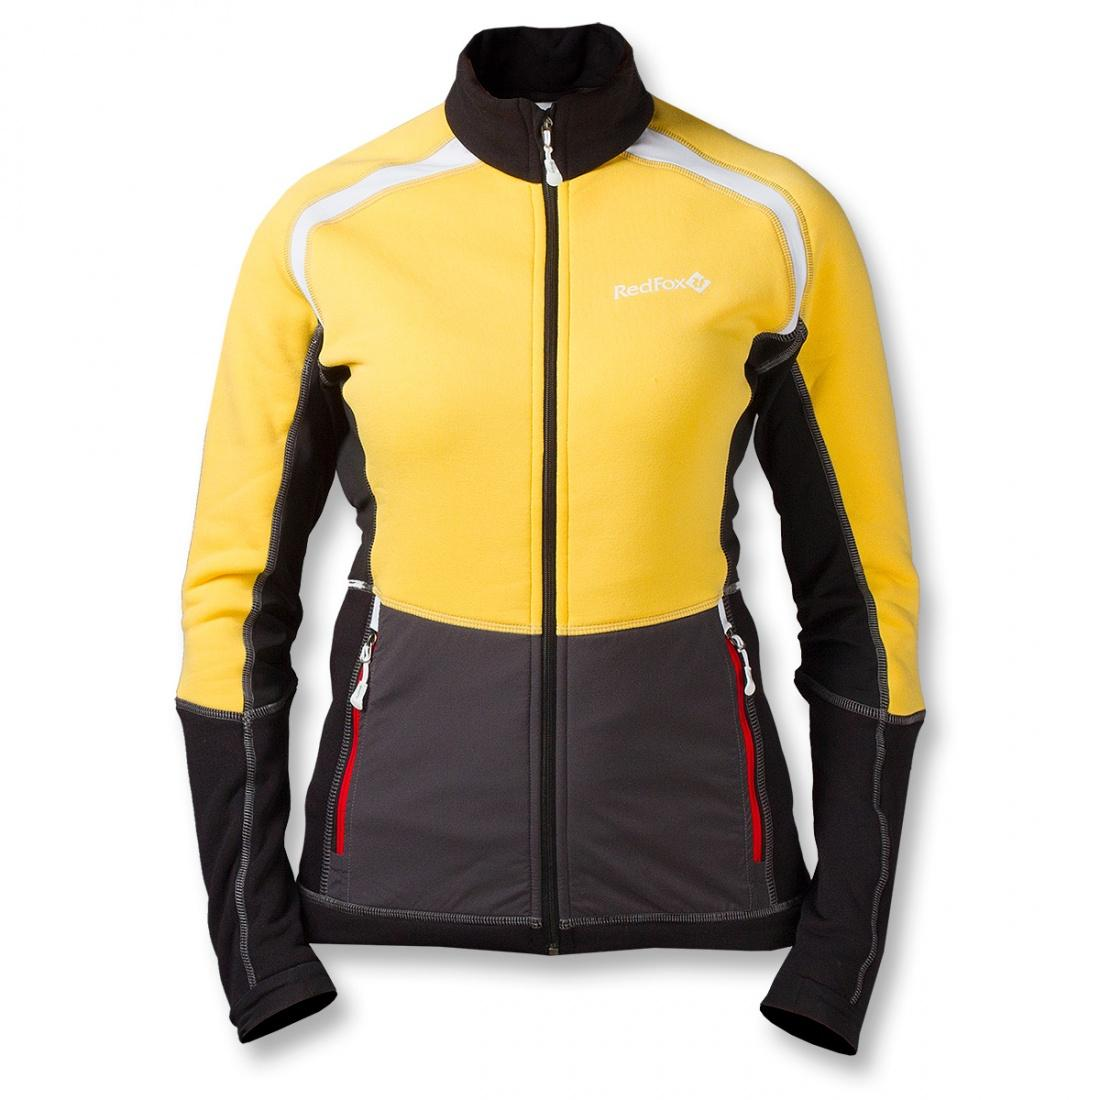 Куртка St.Line ЖенскаяКуртки<br><br><br>Цвет: Желтый<br>Размер: 50